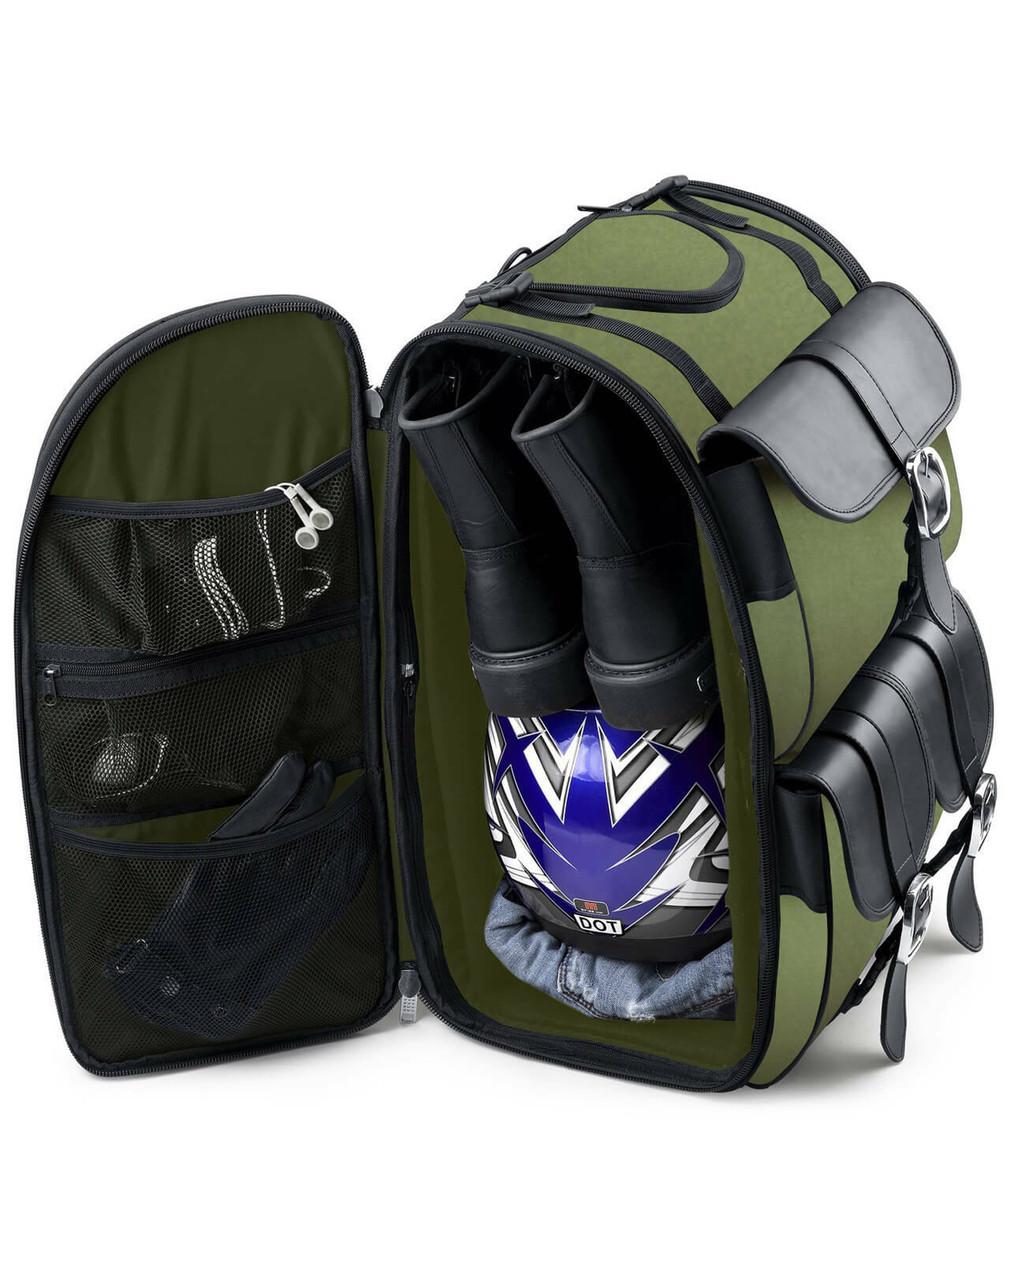 Viking Extra Large Plain Green Motorcycle Sissy Bar Bag For Harley Davidson Storage View